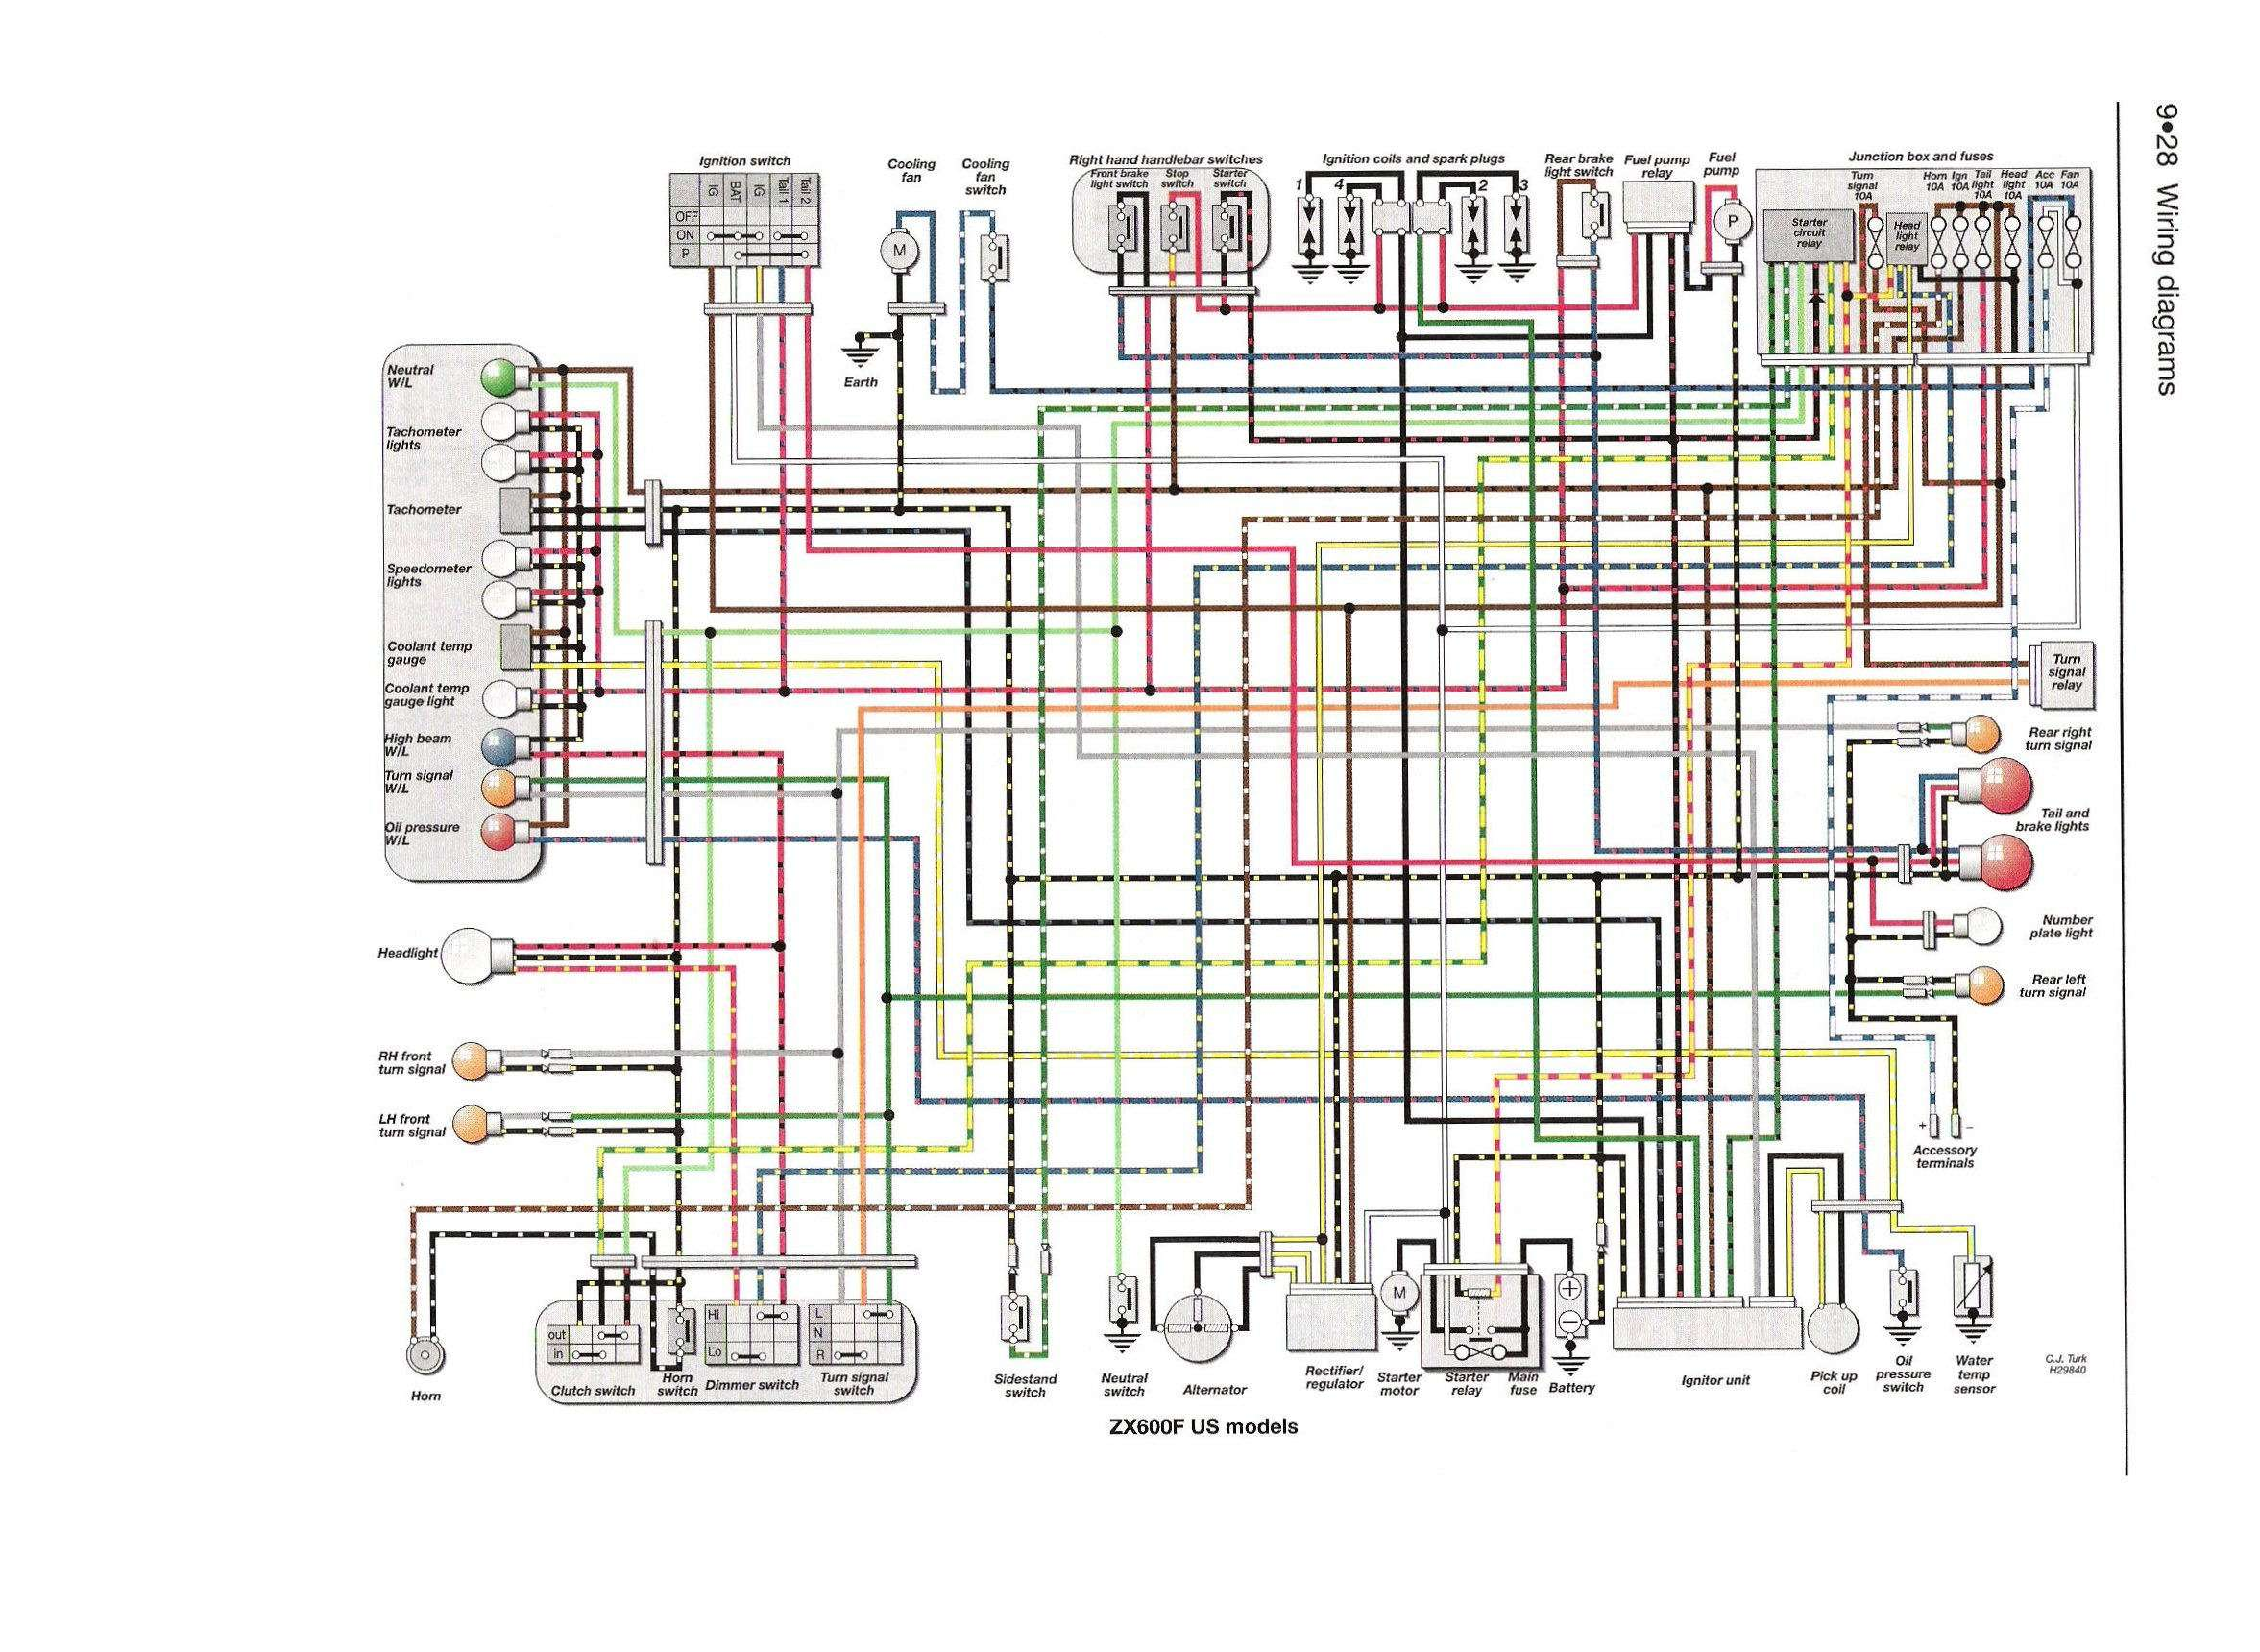 Zx600 Wiring Diagram - Mopar 7 Pin Wiring Harness for Wiring Diagram  SchematicsWiring Diagram Schematics